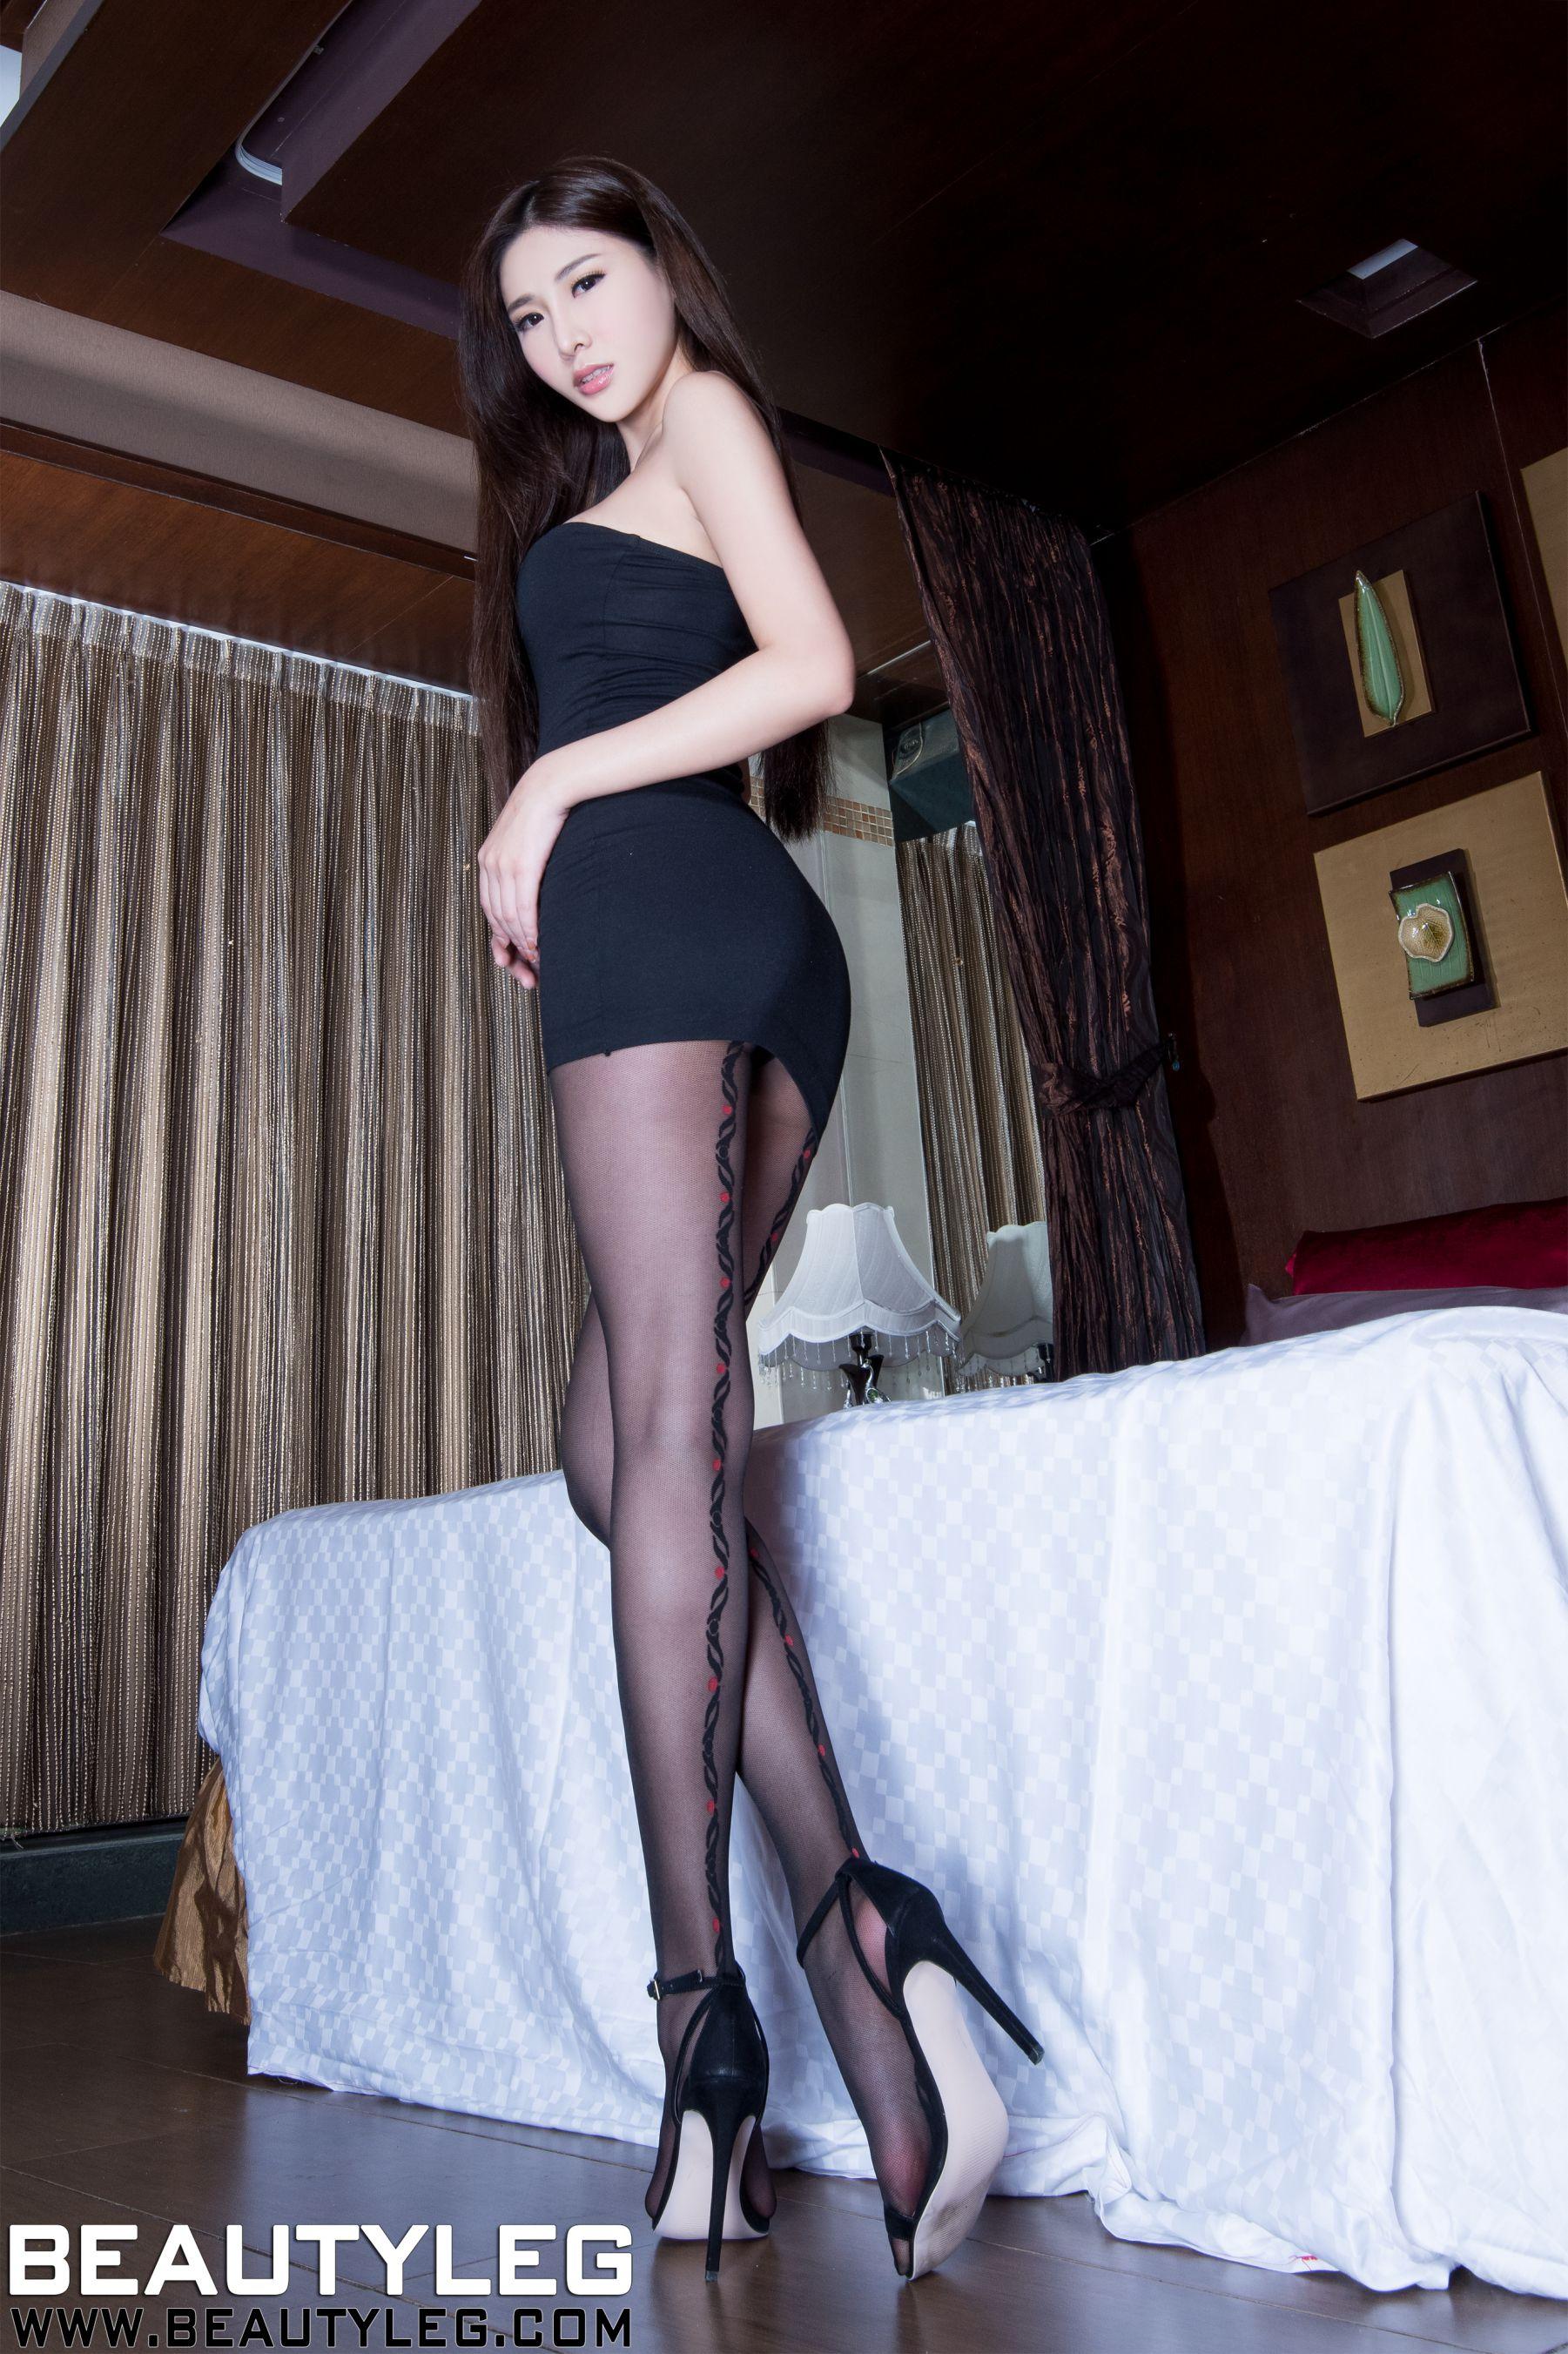 VOL.1781 [Beautyleg]高跟美腿:李小星(Beautyleg腿模Xin)高品质写真套图(49P)